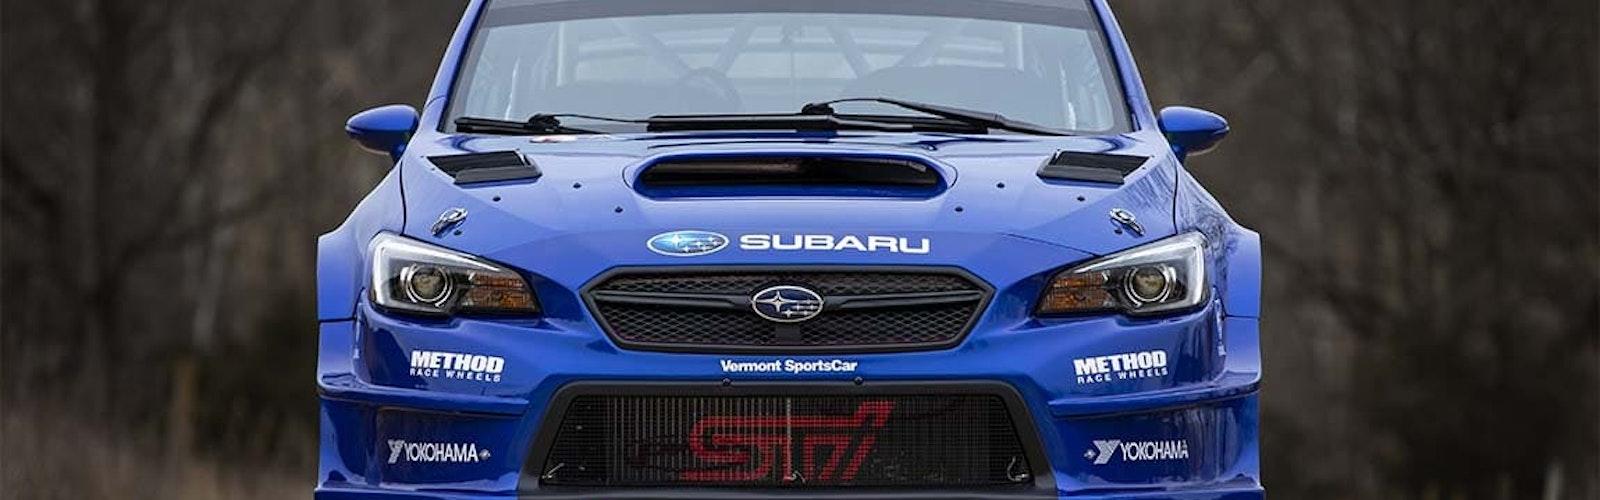 Subaru-VT19r-3